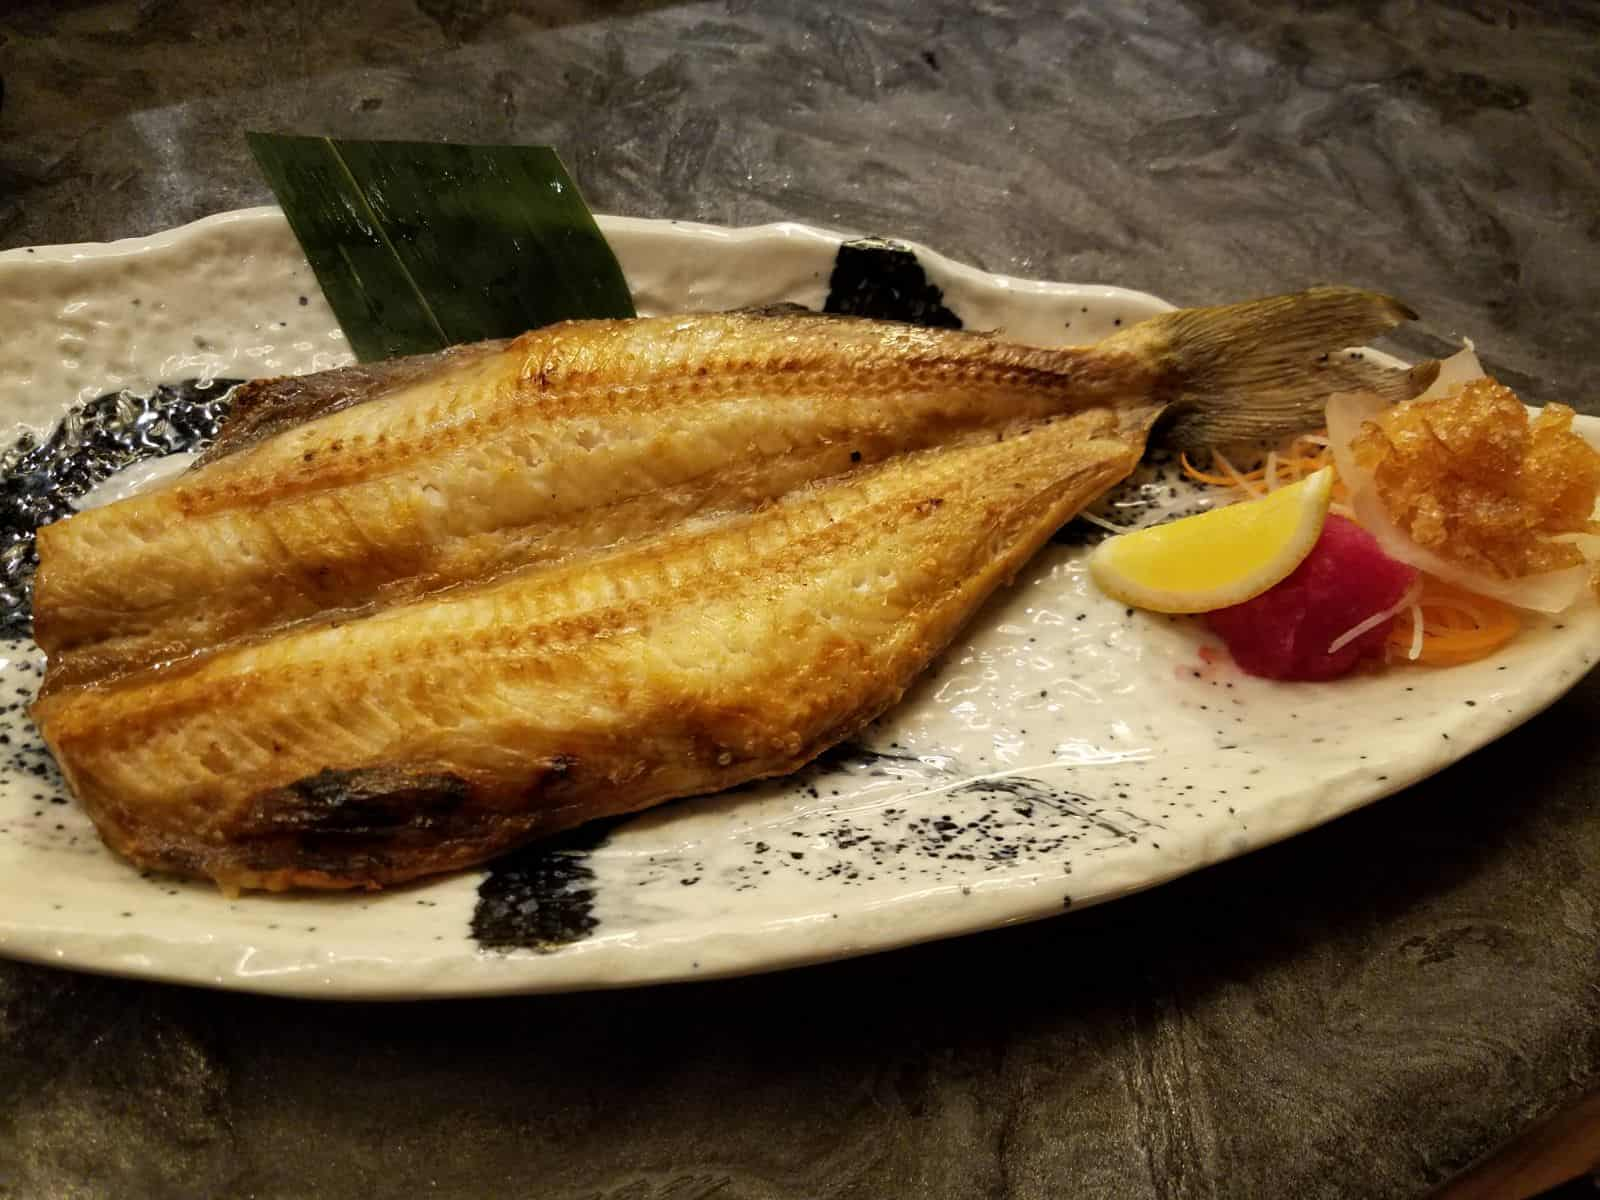 image-of-Grilled-Dried-Atka-Mackerel-ほっけの一夜干し-花魚一夜干